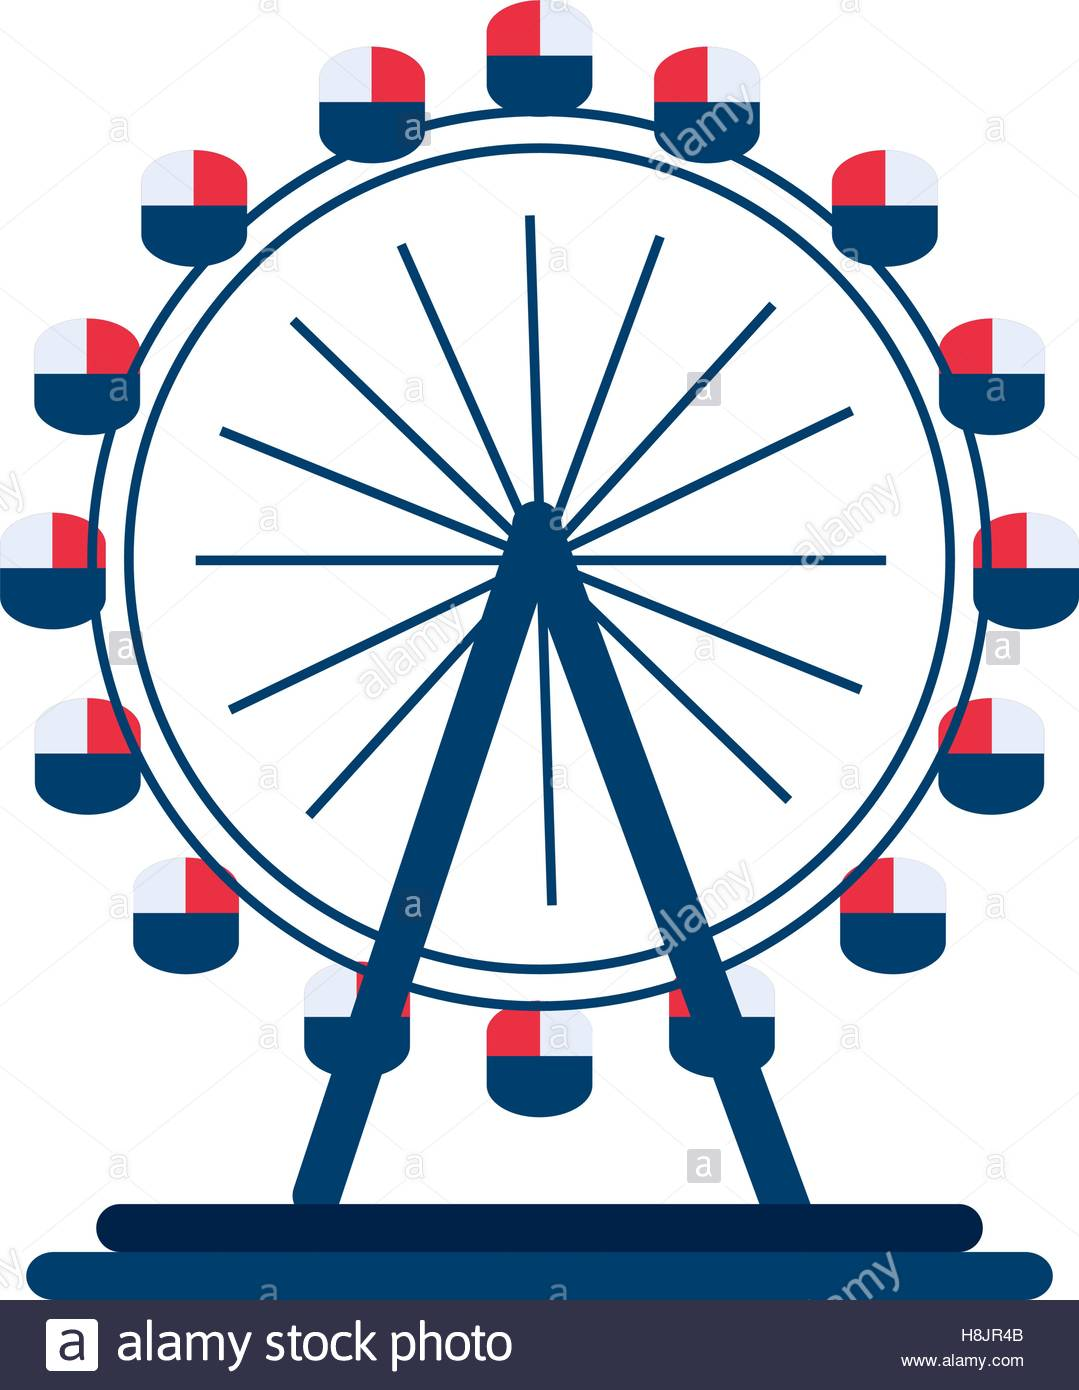 1079x1390 London Eye Wheel Stock Vector Art Amp Illustration, Vector Image